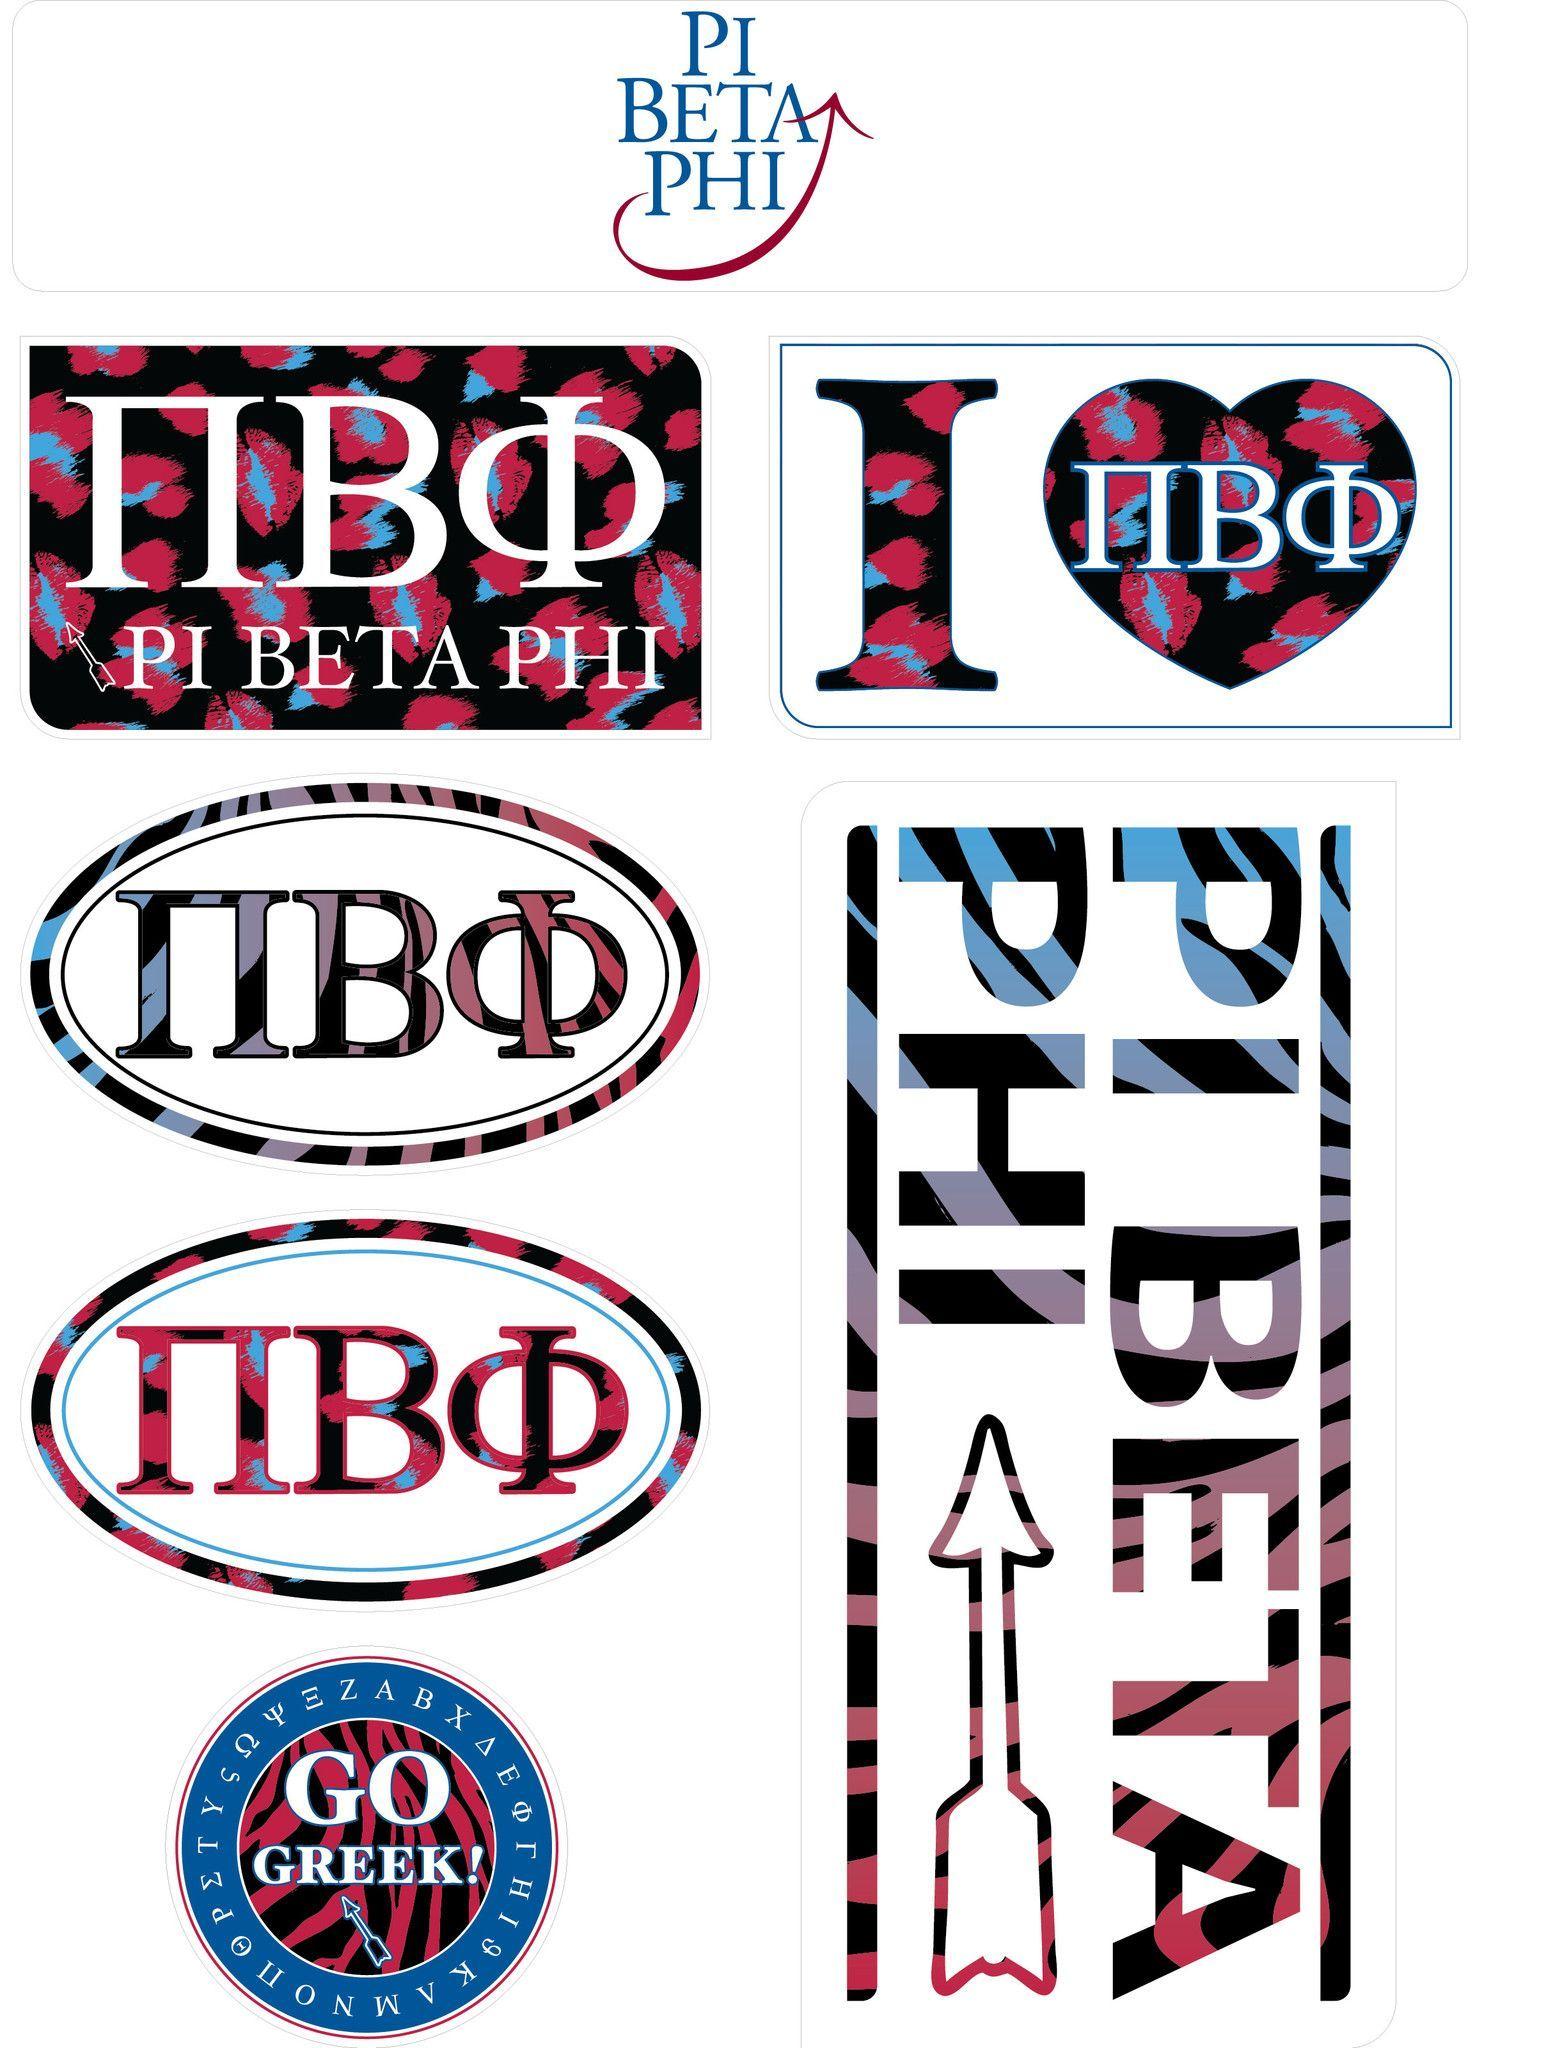 Pi Beta Phi Animal Print Stickers